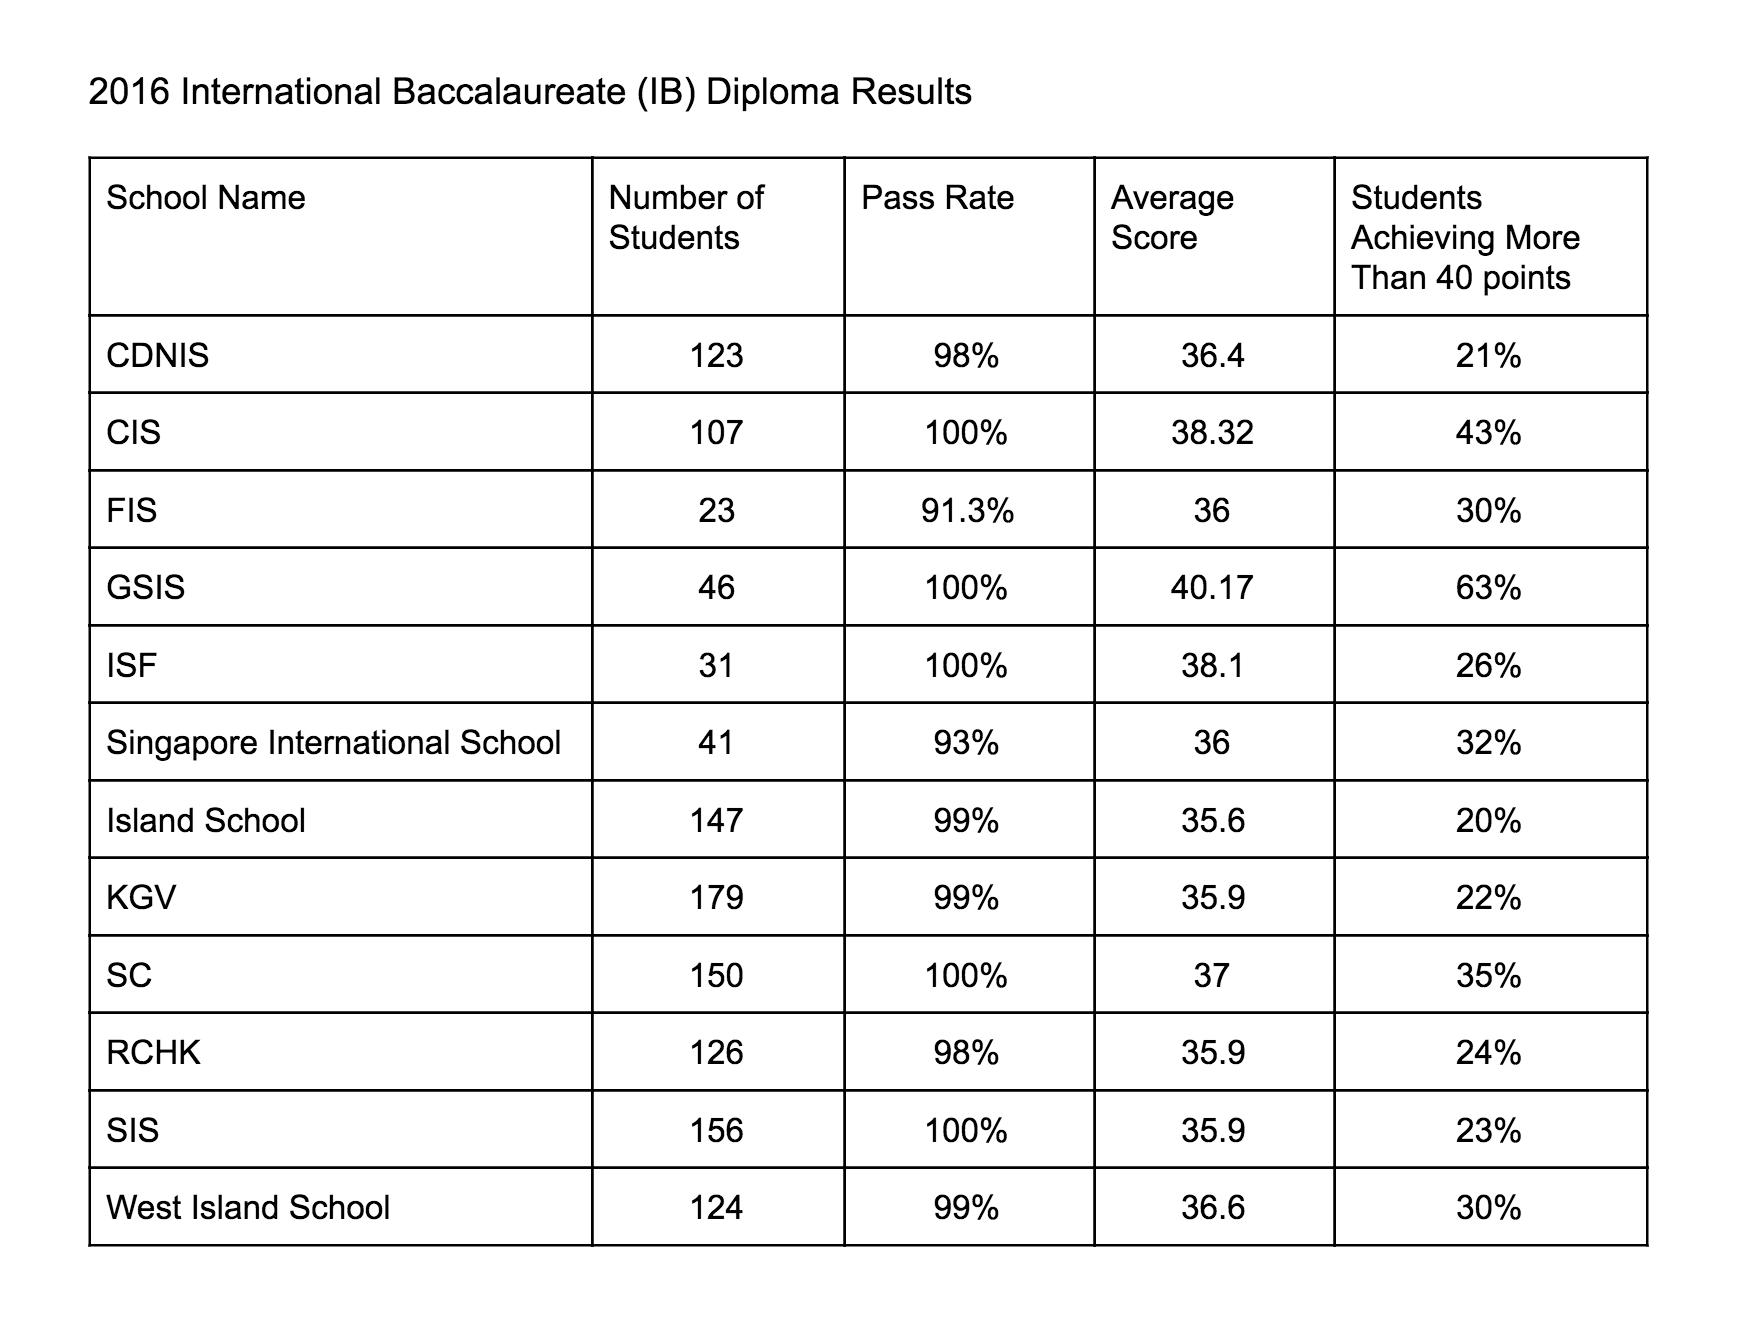 2016 International Baccalaureate (IB) Diploma Results